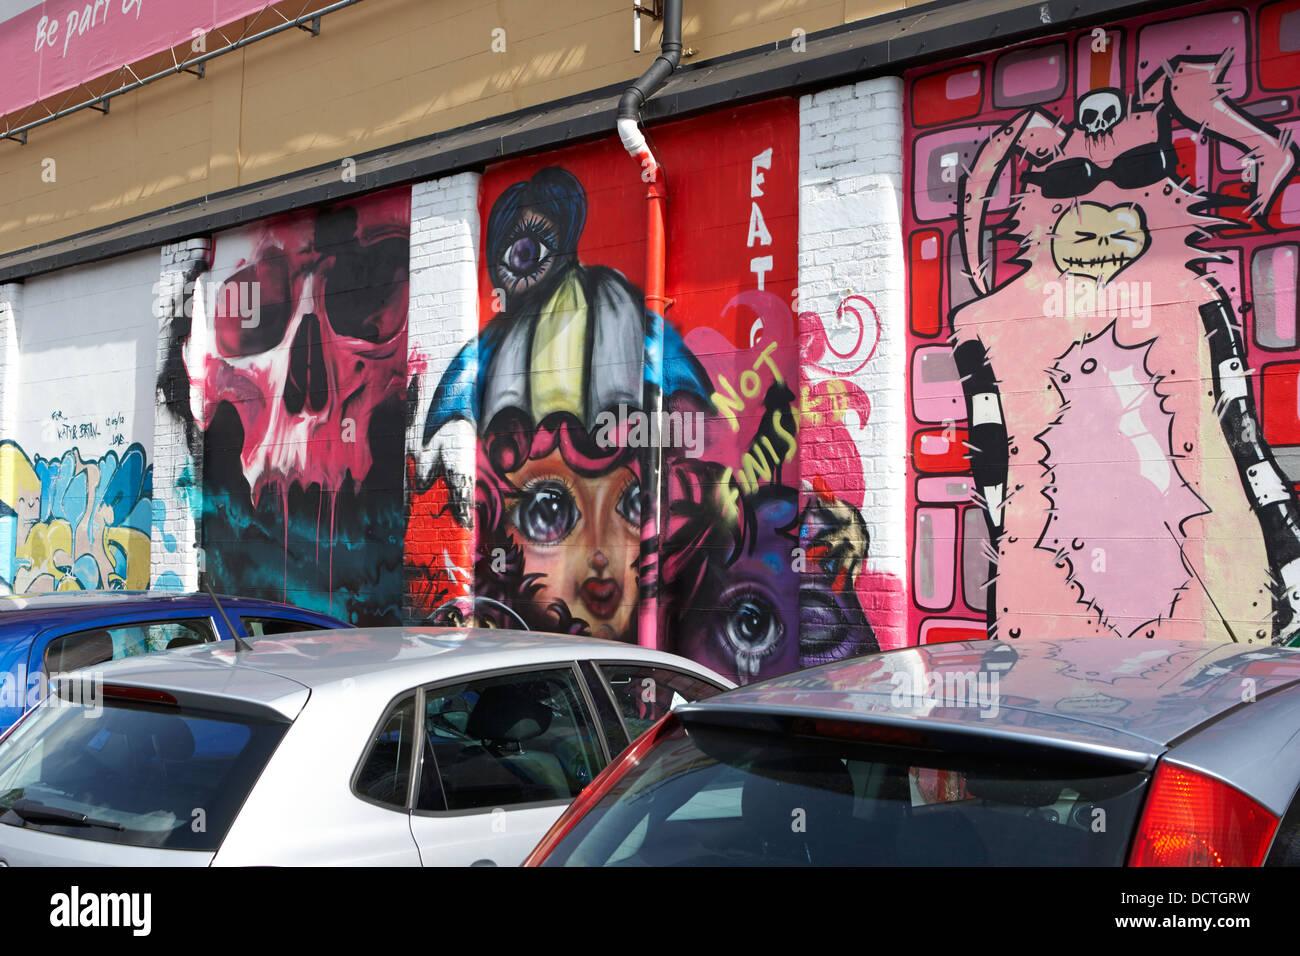 Graffiti wall art uk - Stock Photo Graffiti Wall Art In A Public Car Park In Belfast Northern Ireland Uk